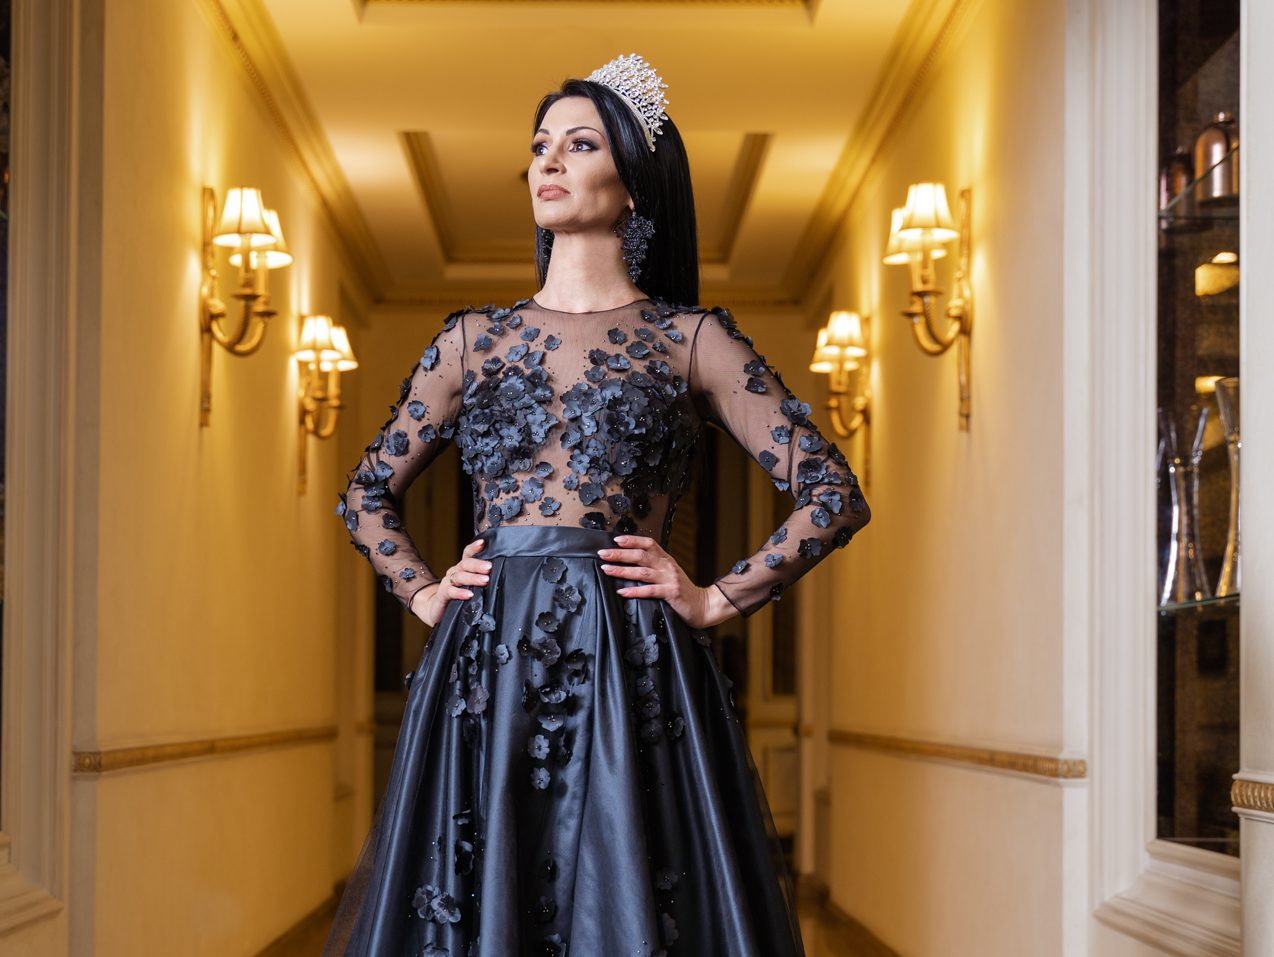 Мисис Бургас Вержиния Иванова стана лице на новата кампания на конкурса